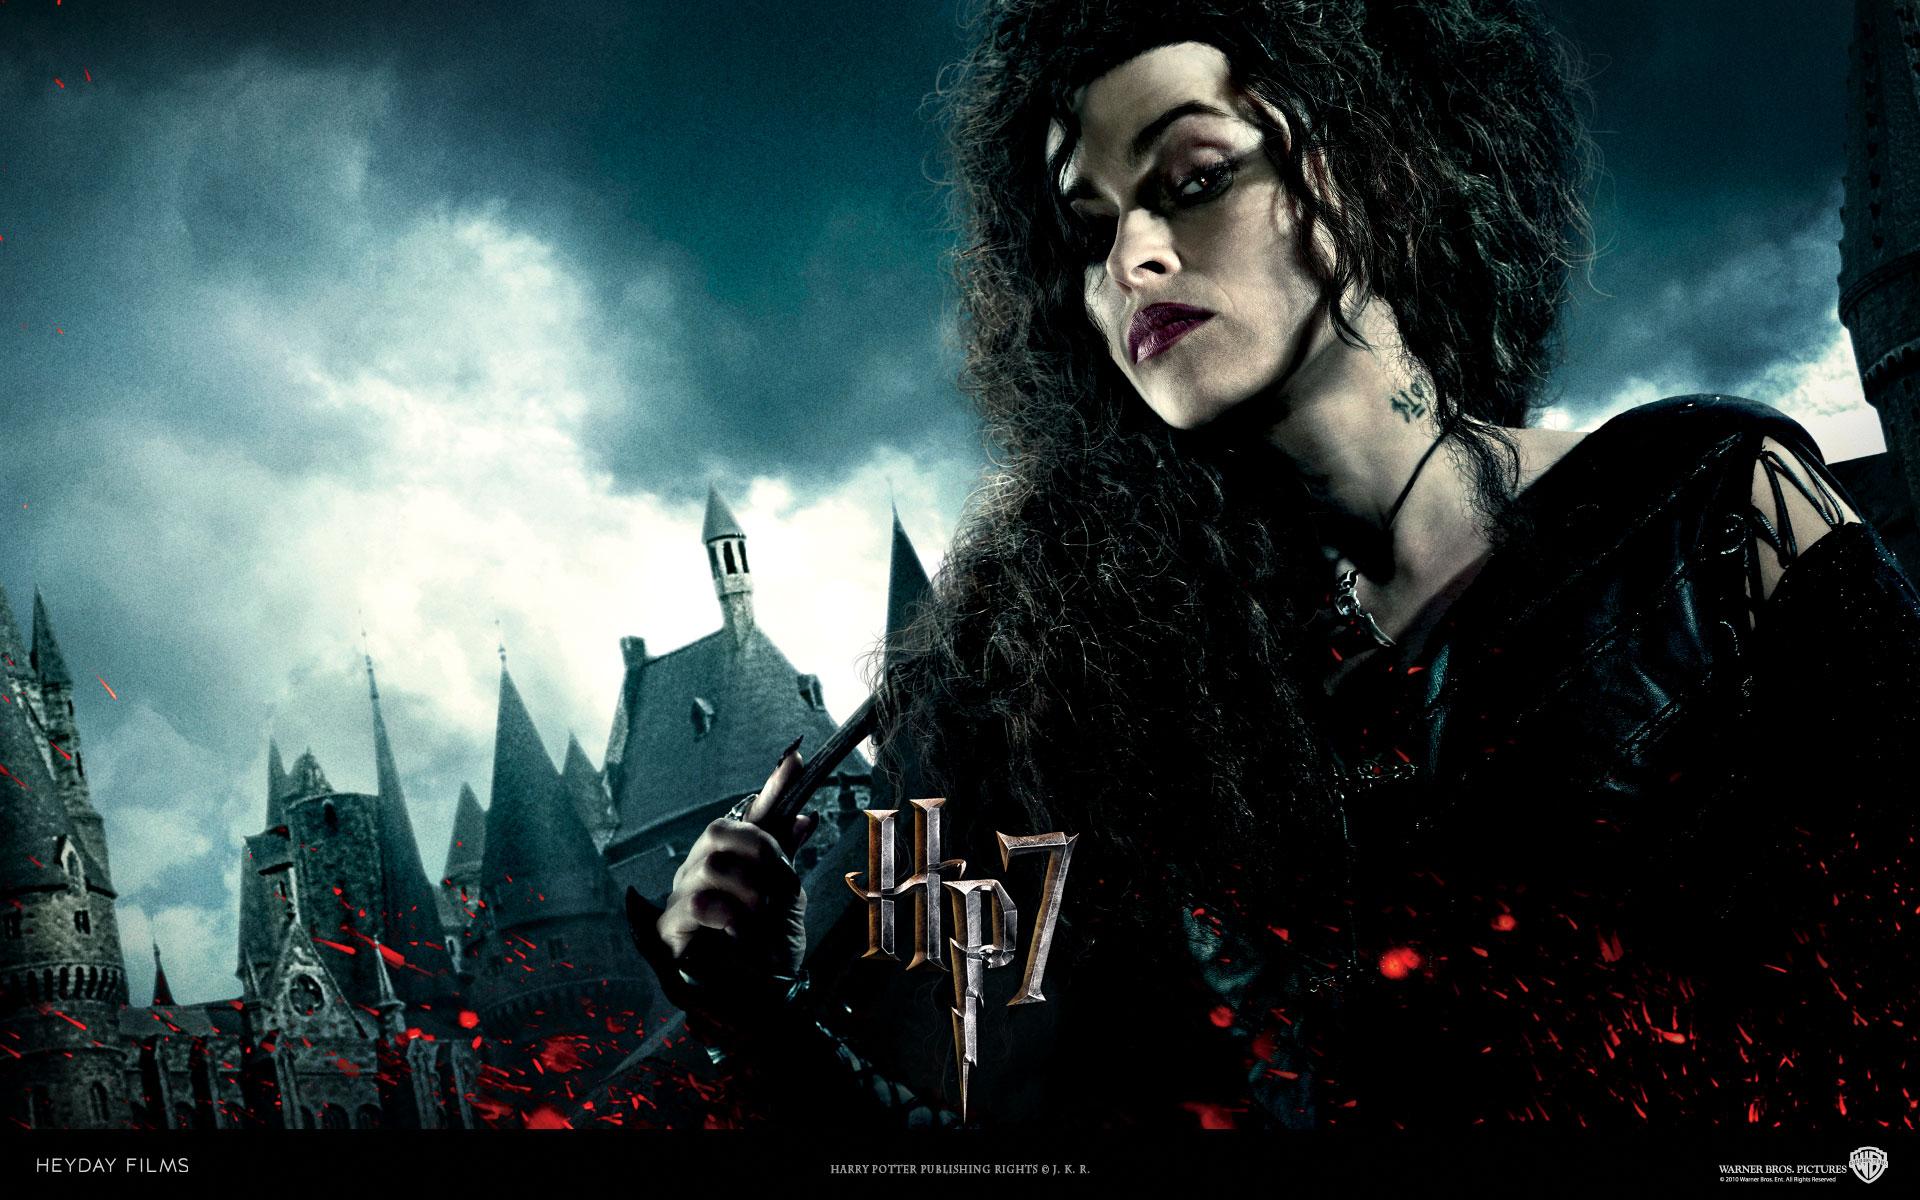 Harry Potter Bellatrix Wallpapers W3 Directory Wallpapers